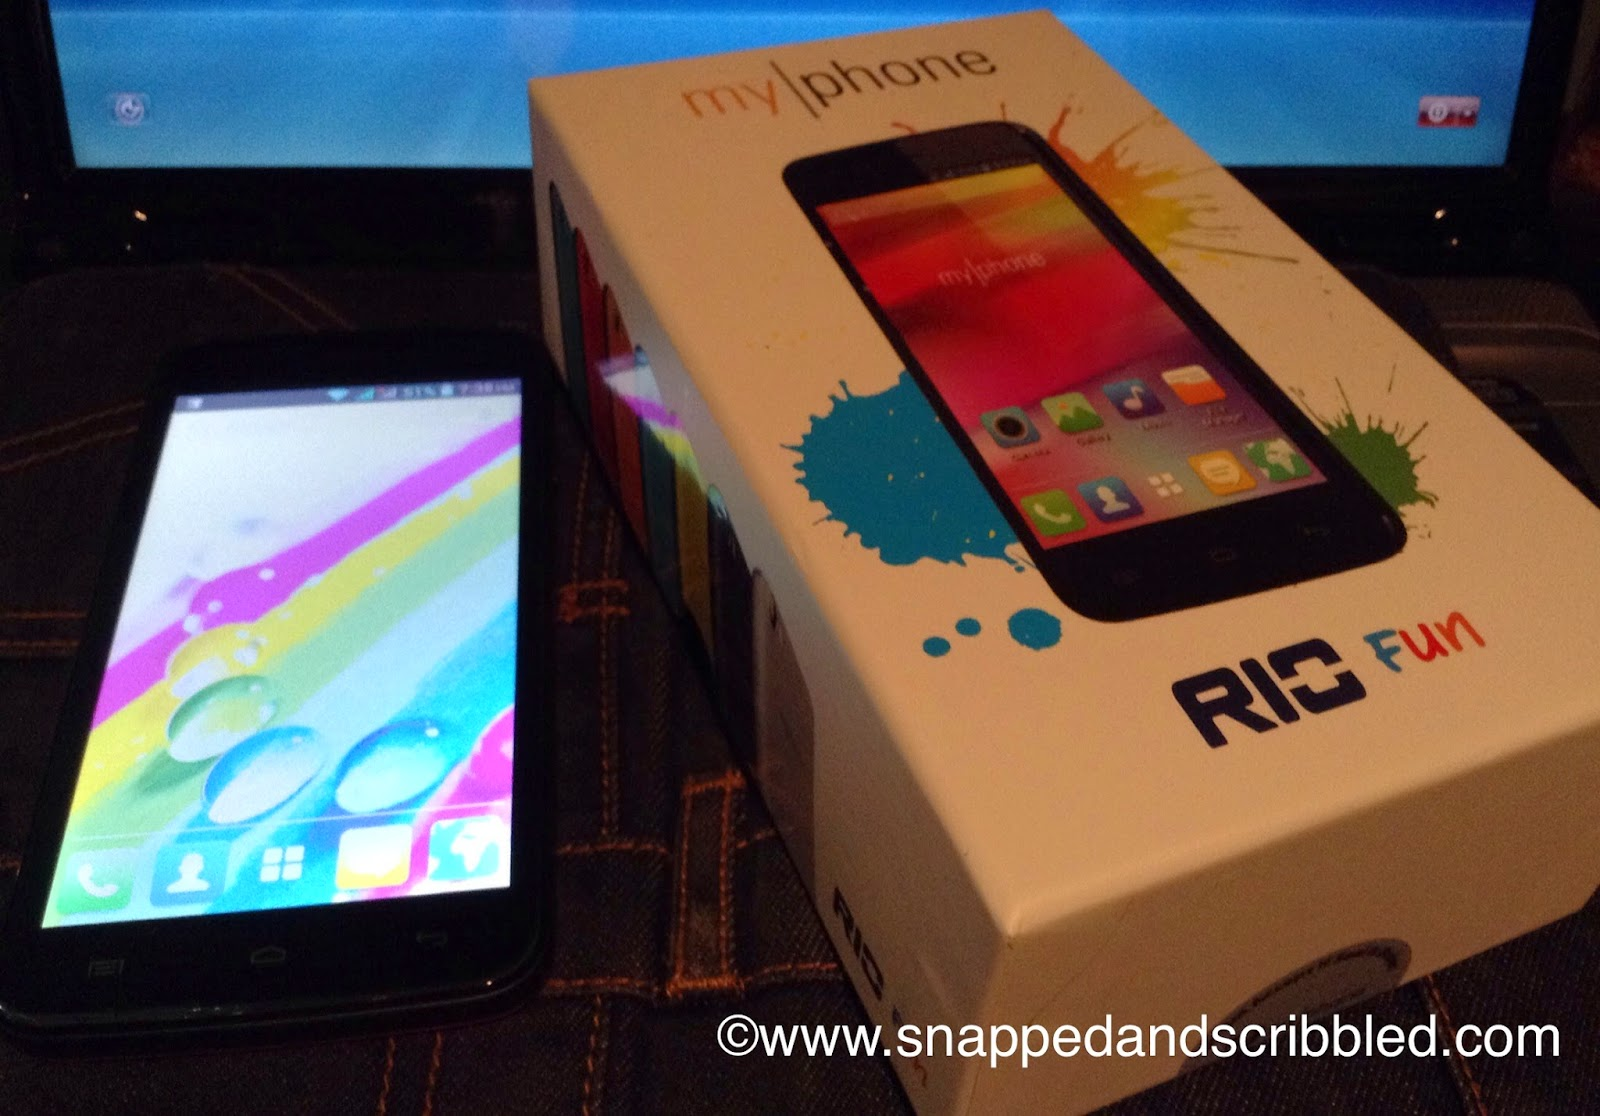 Affordable SmartPhone: MyPhone Rio Fun